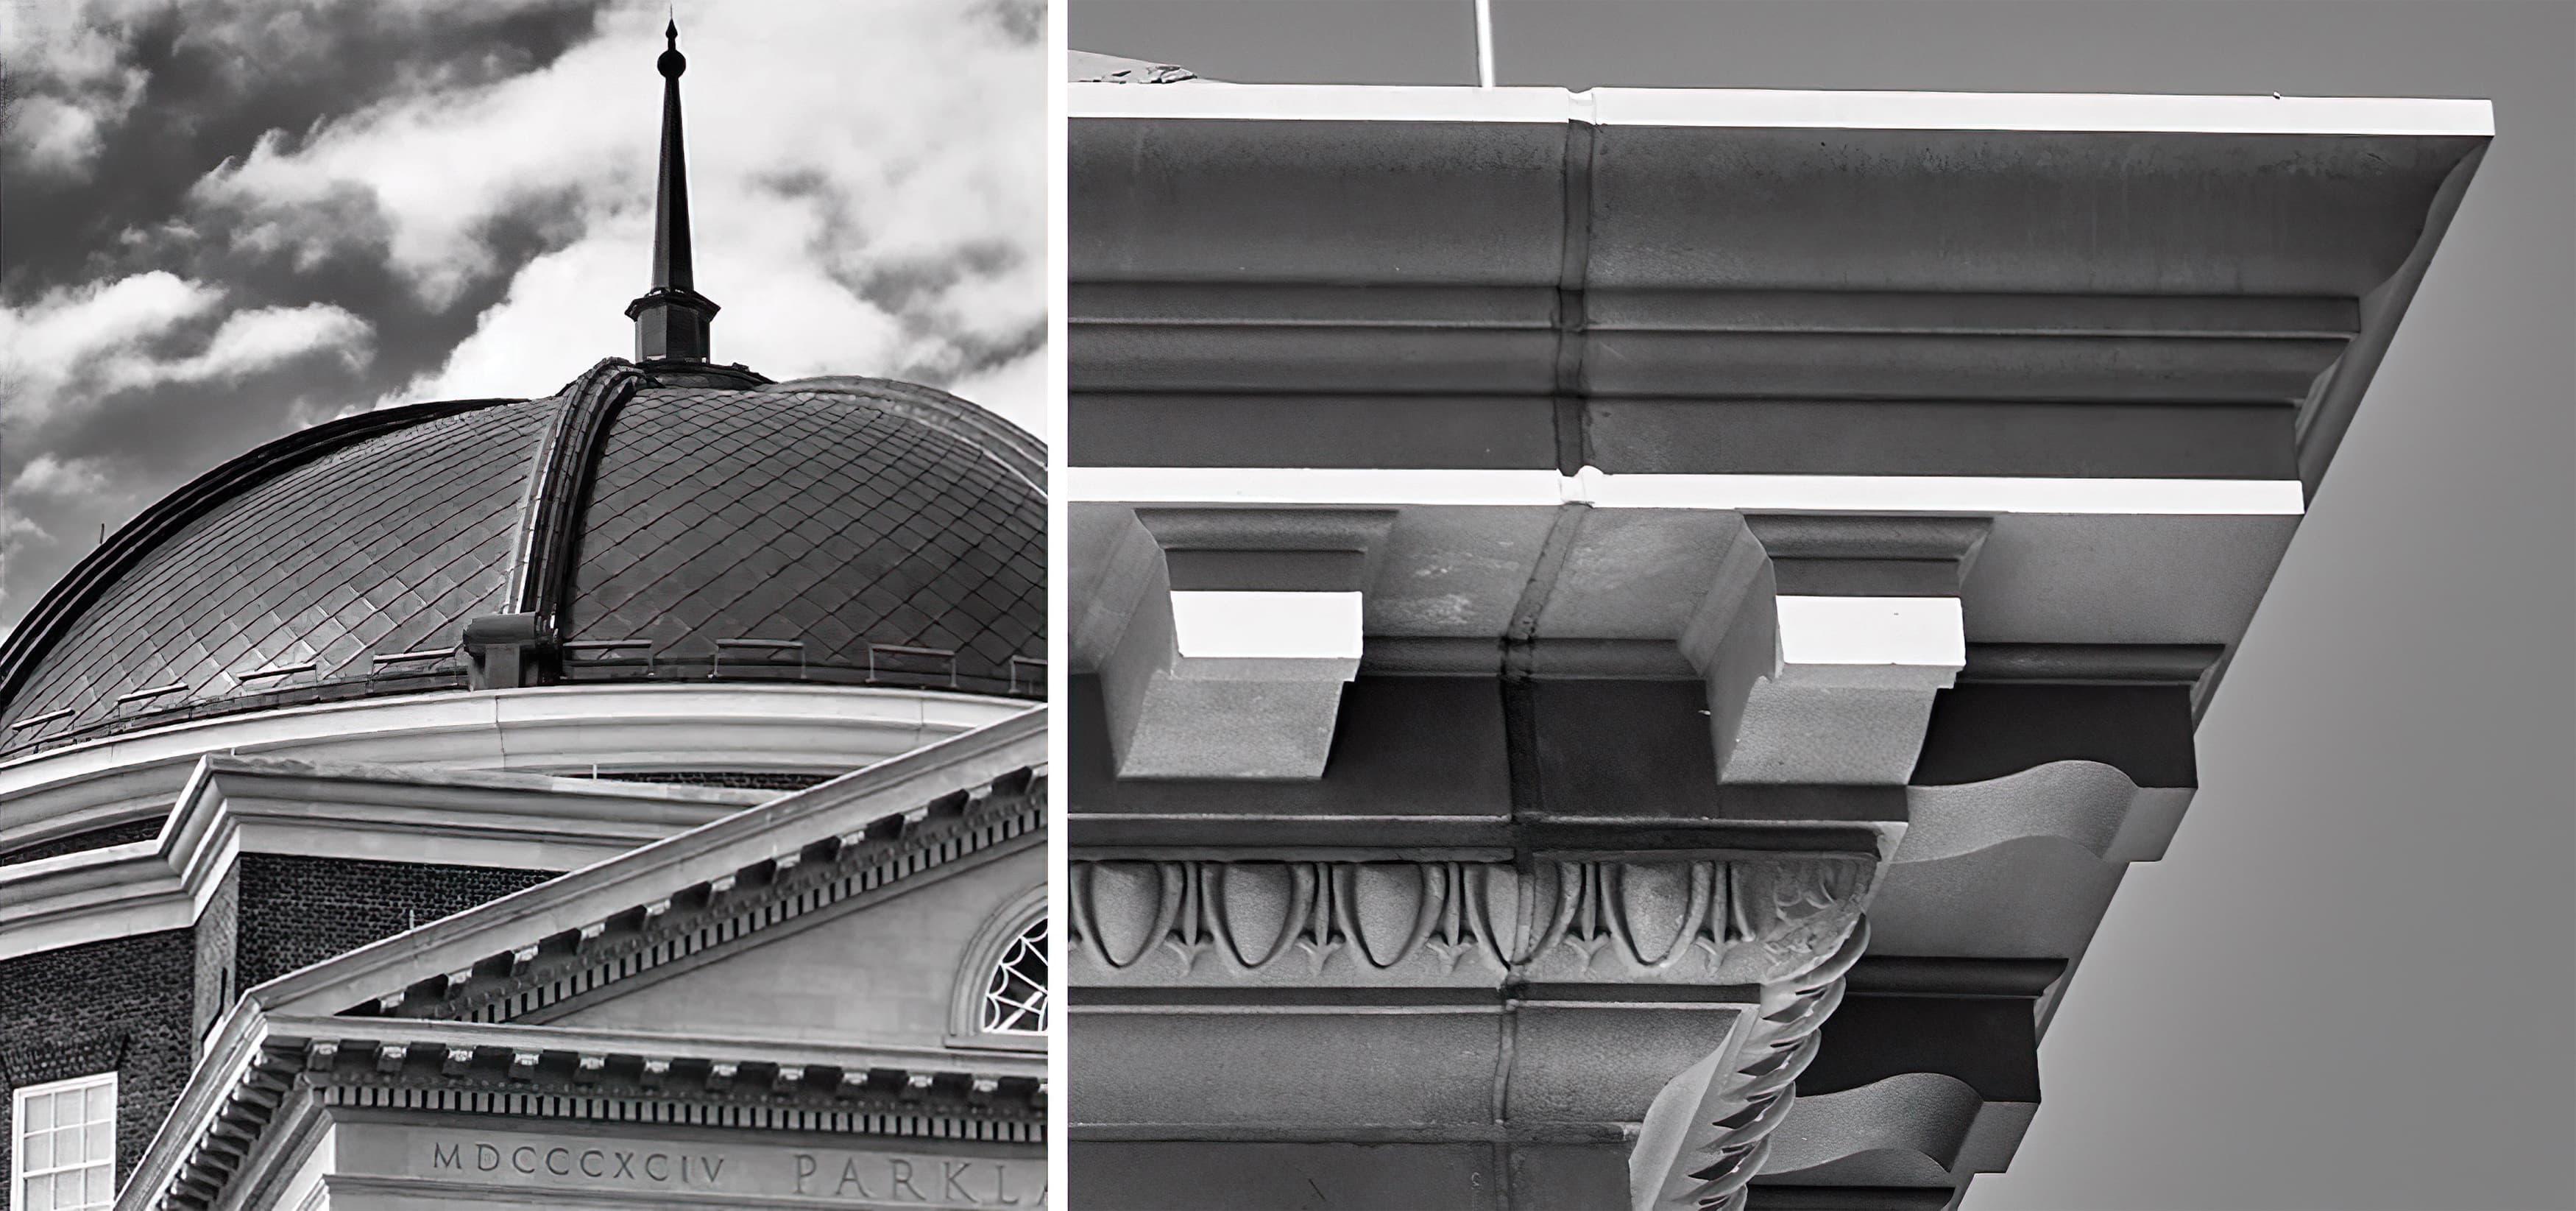 Old Parkland Campus in Dallas, Texas. Neo-Classical Architecture. Civic Design, Cultural Design, Workplace Design.